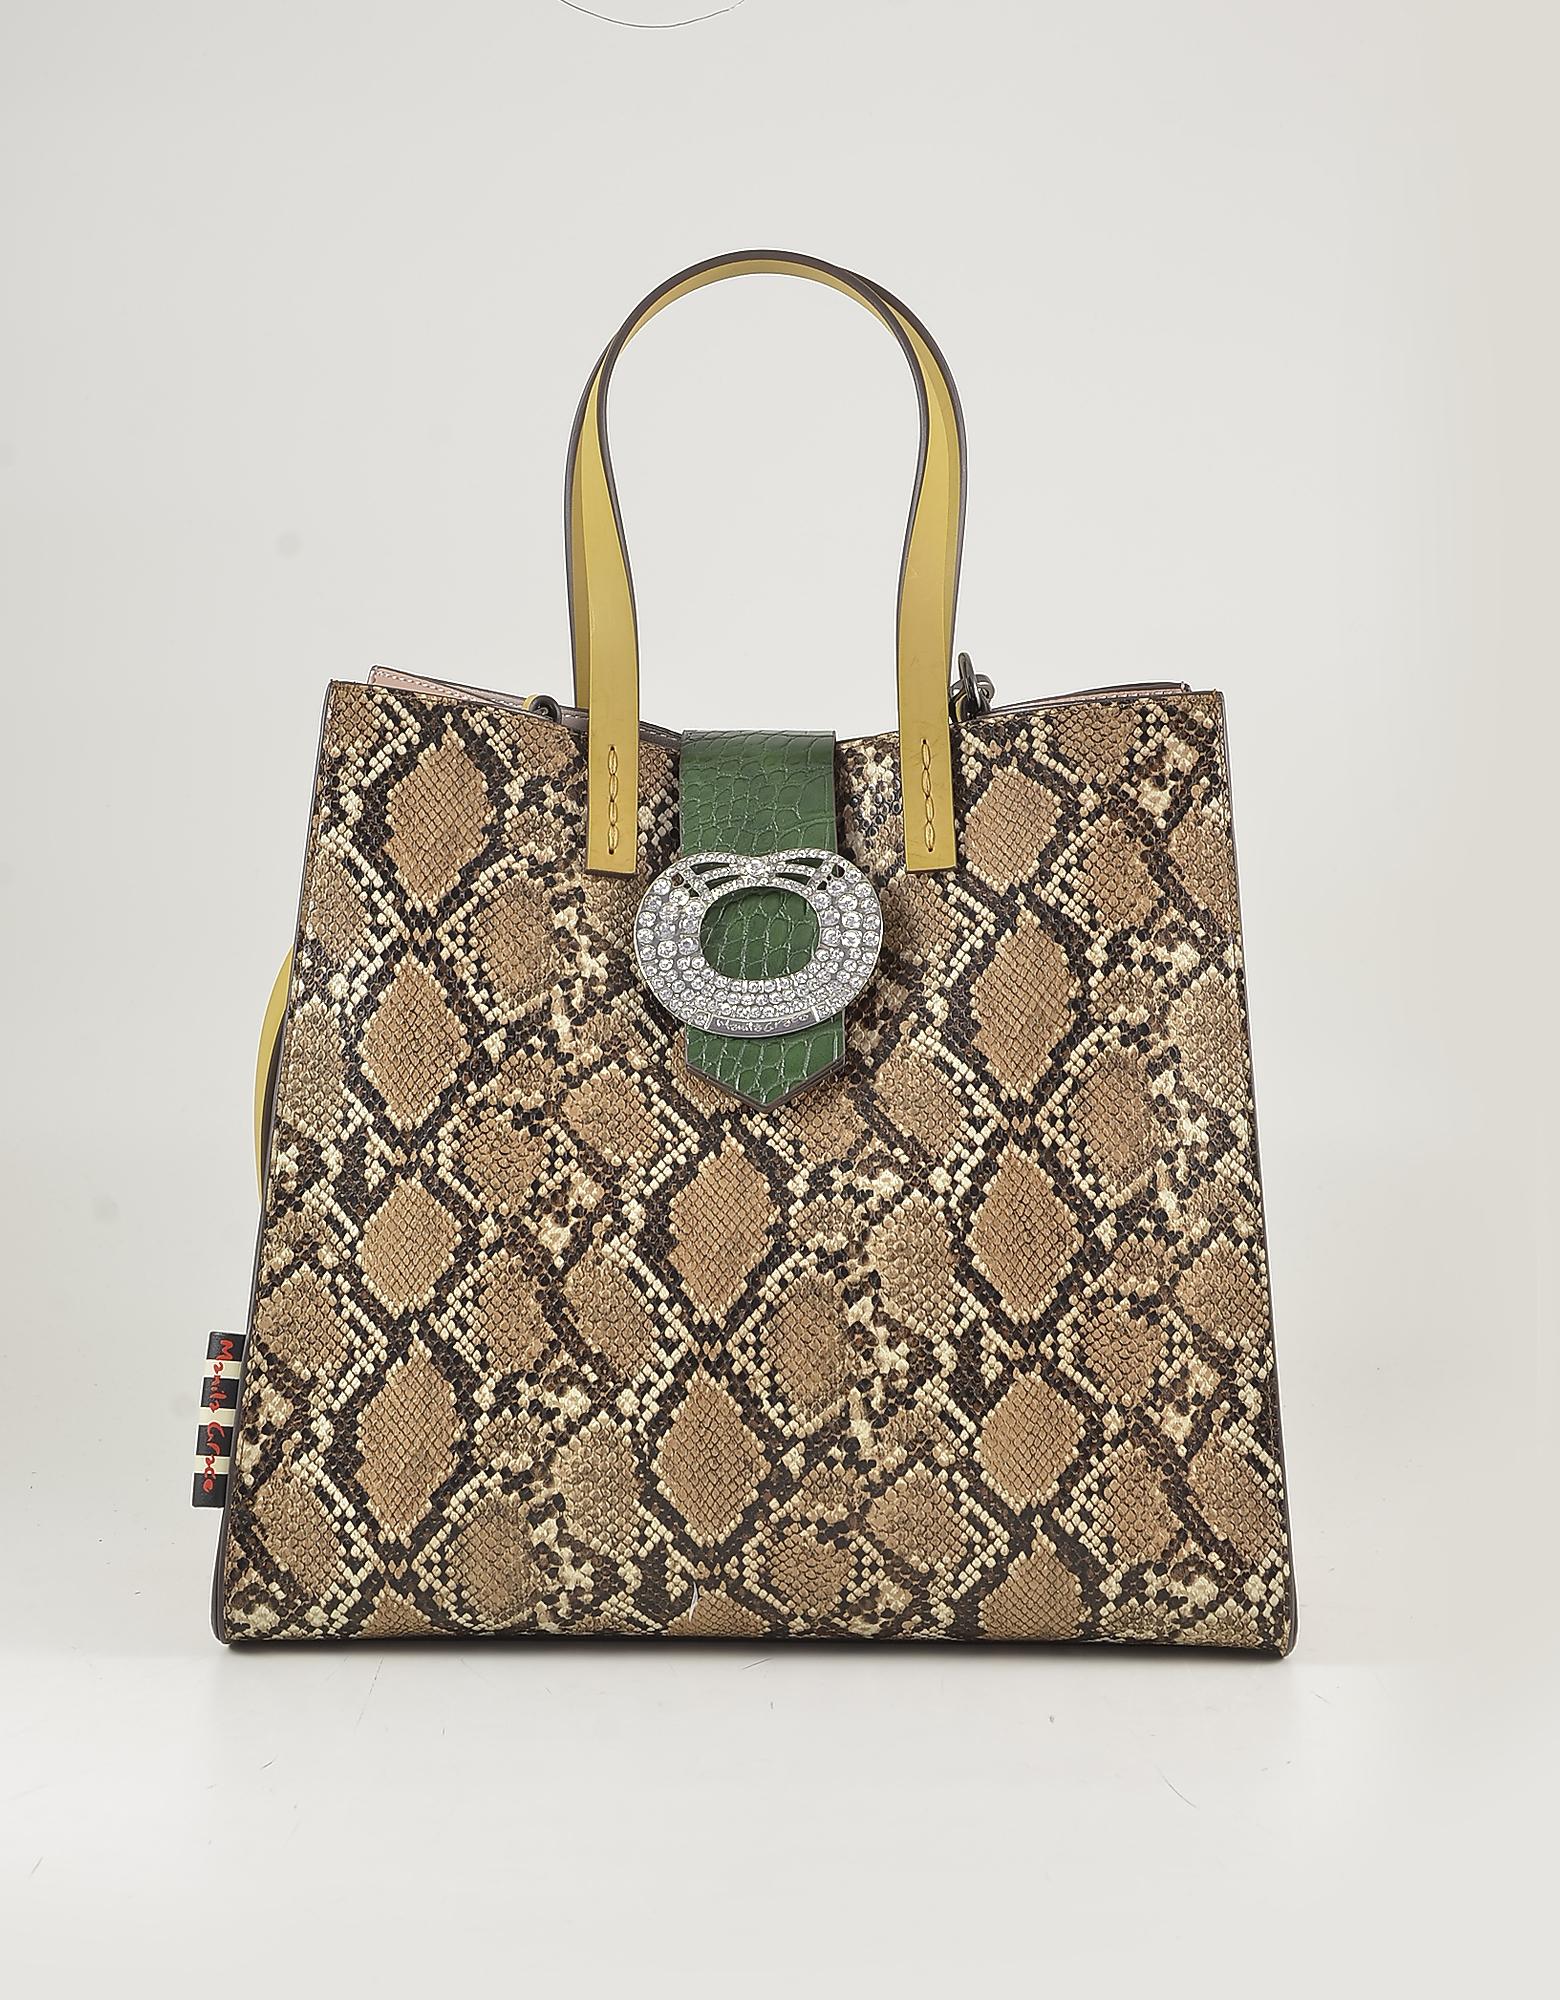 Manila Grace Light Brown Animal Print Eco Leather Tote Bag